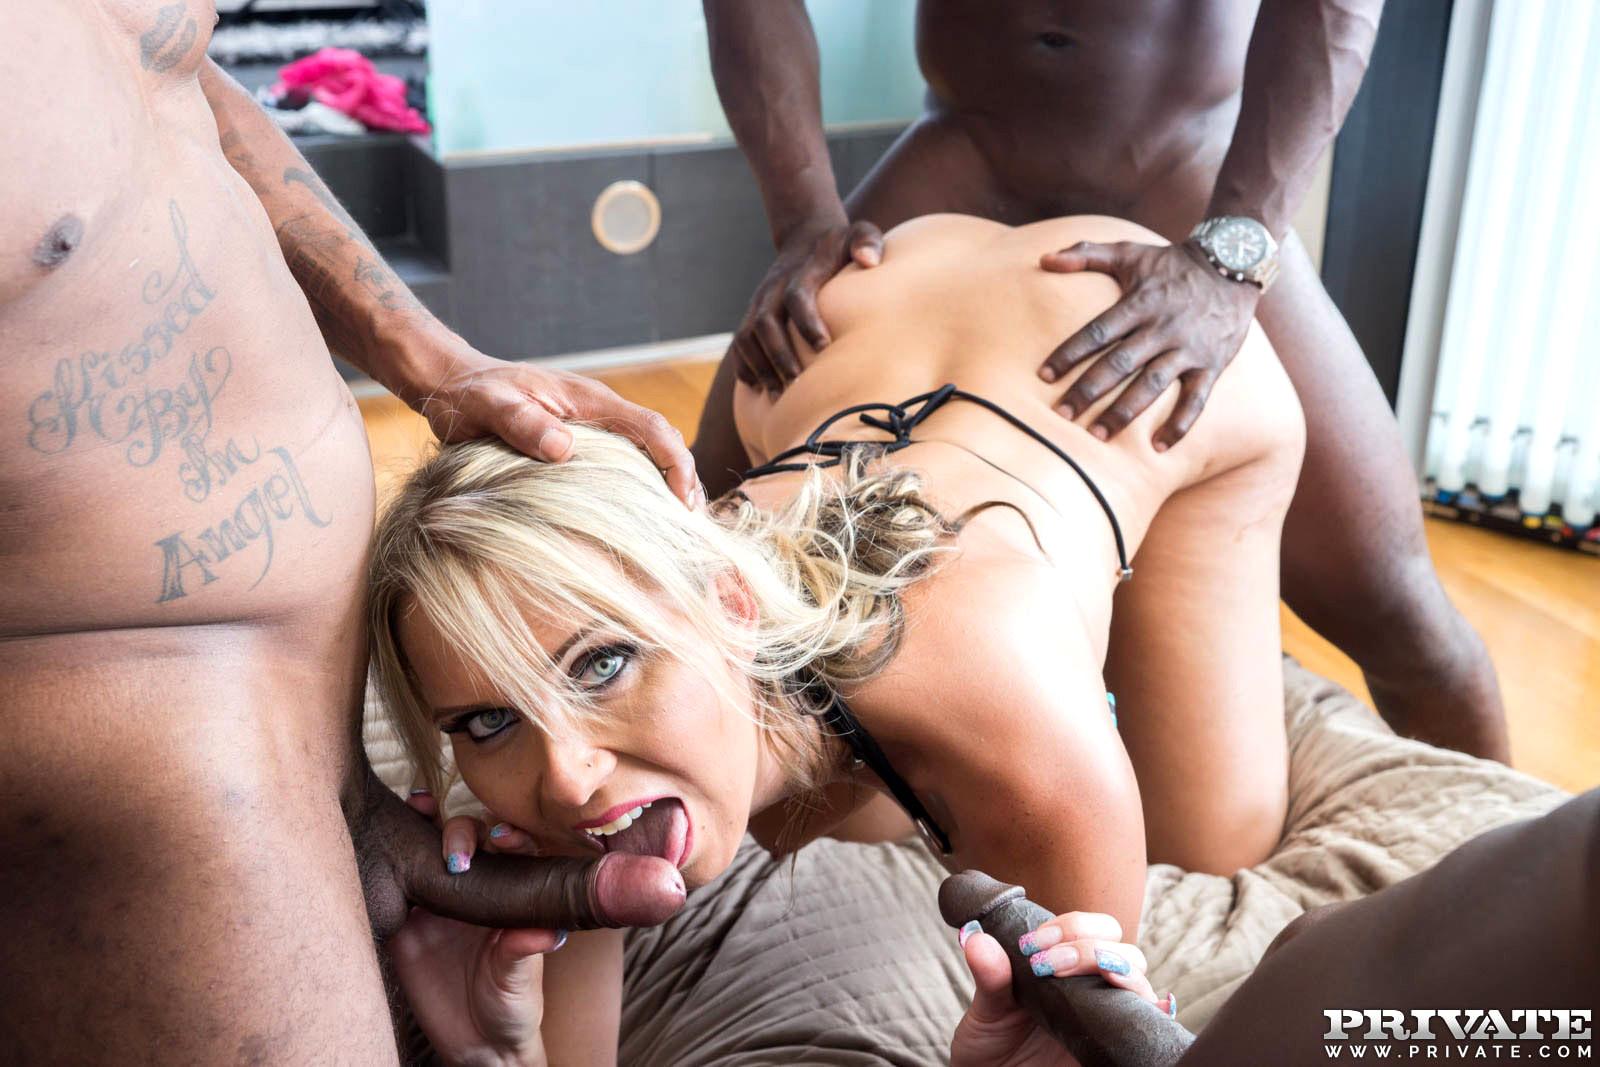 Sex HD mobile pics dogfart network julie cash high level interracial gangbang mag